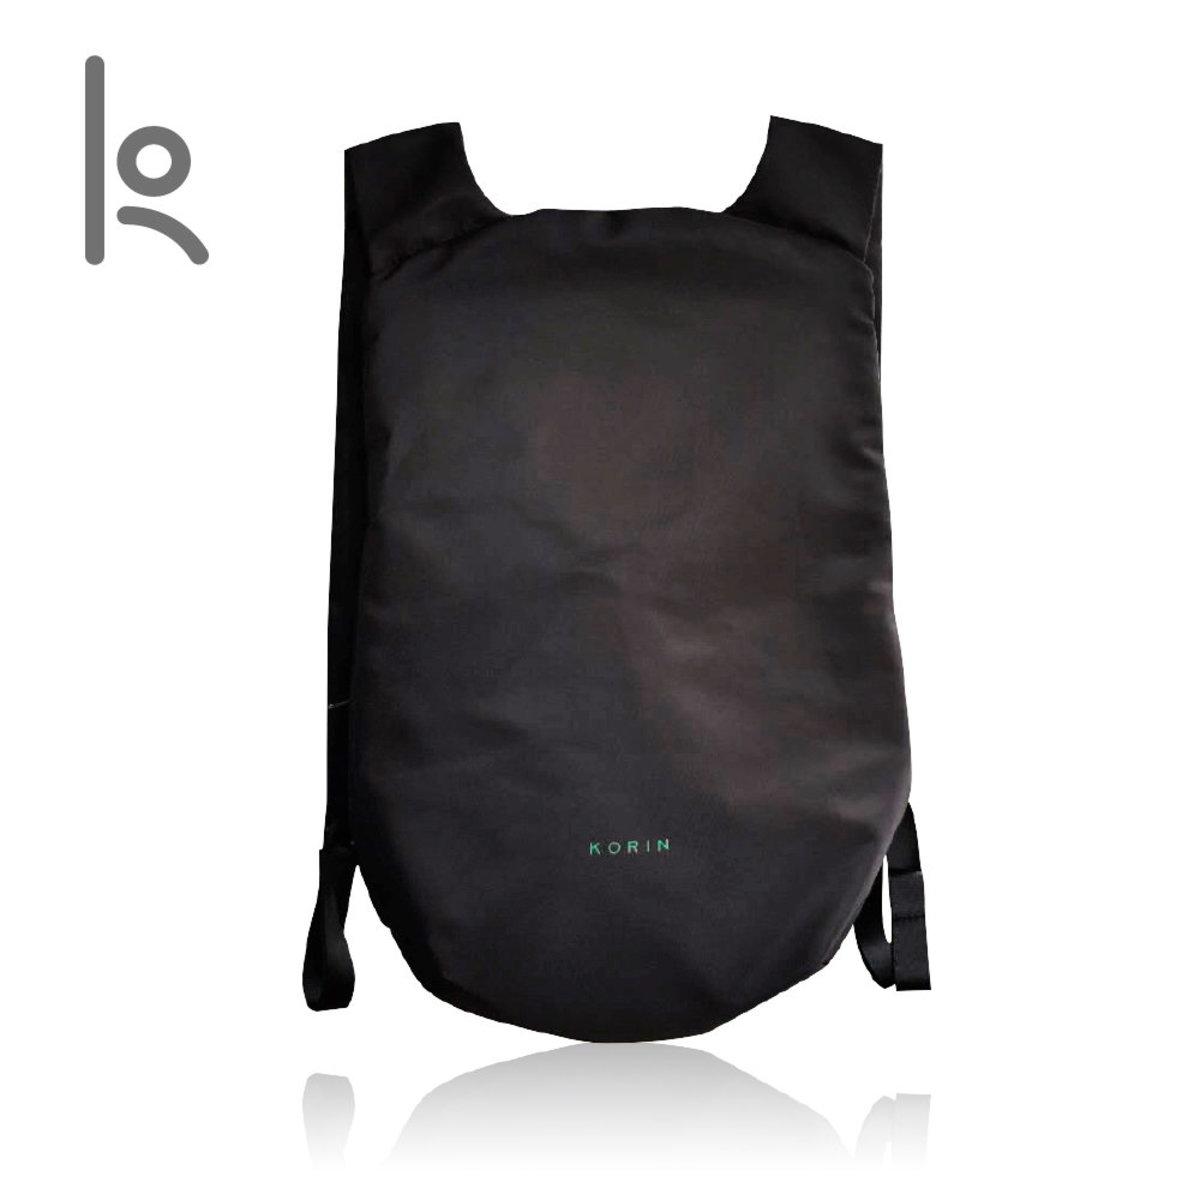 Korin Design FlexPack Air 輕薄隨身後背包